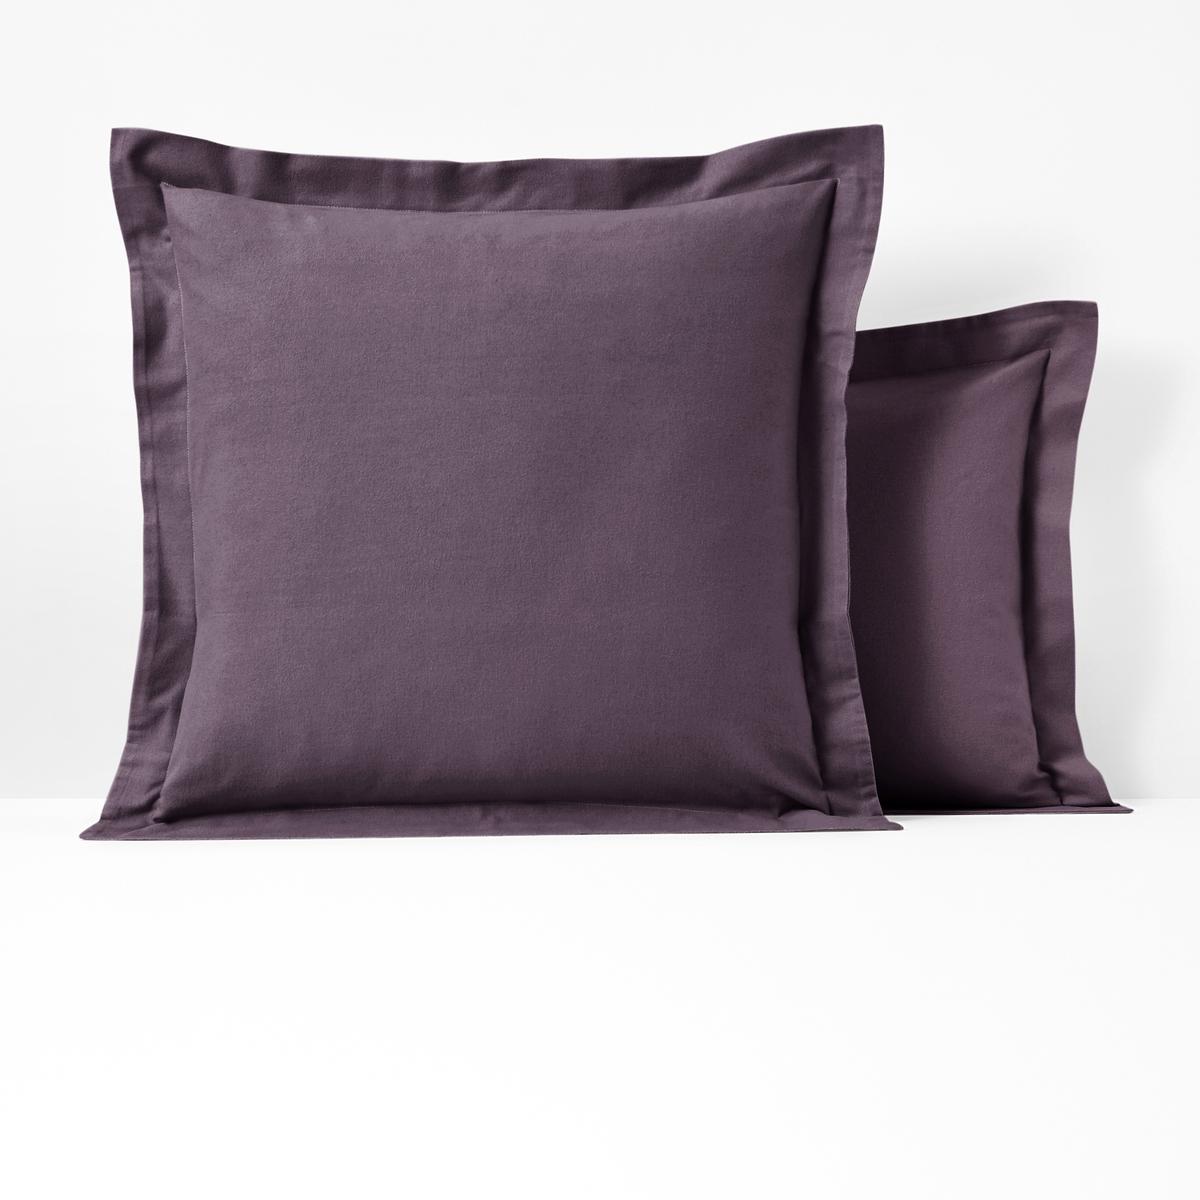 лучшая цена Наволочка La Redoute Или наволочка на подушку-валик SCENARIO 50 x 70 см фиолетовый